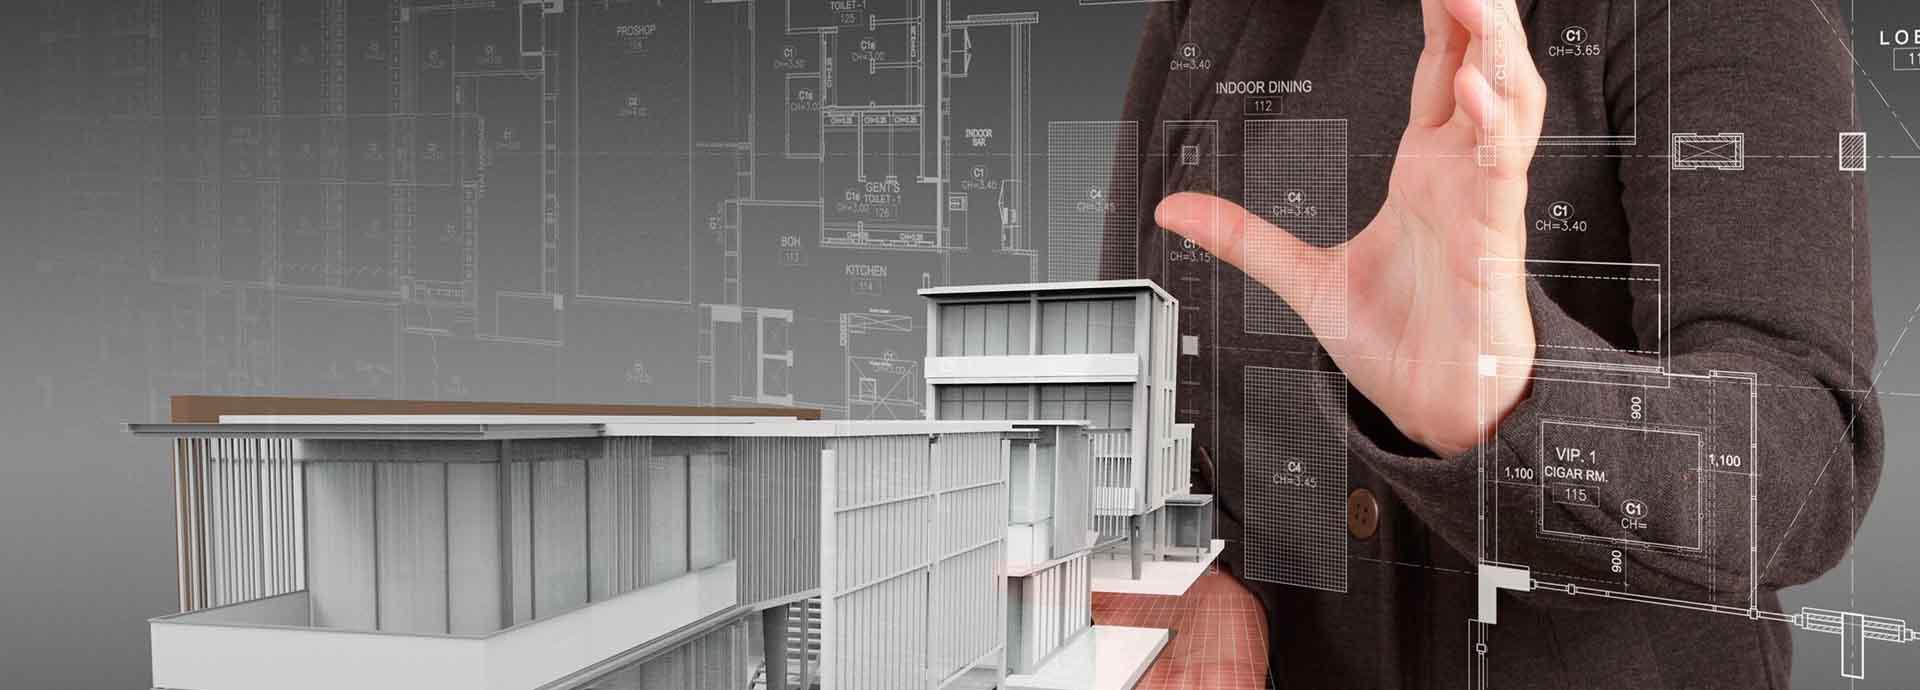 proyectos_arquitectura_mejores_ofertas